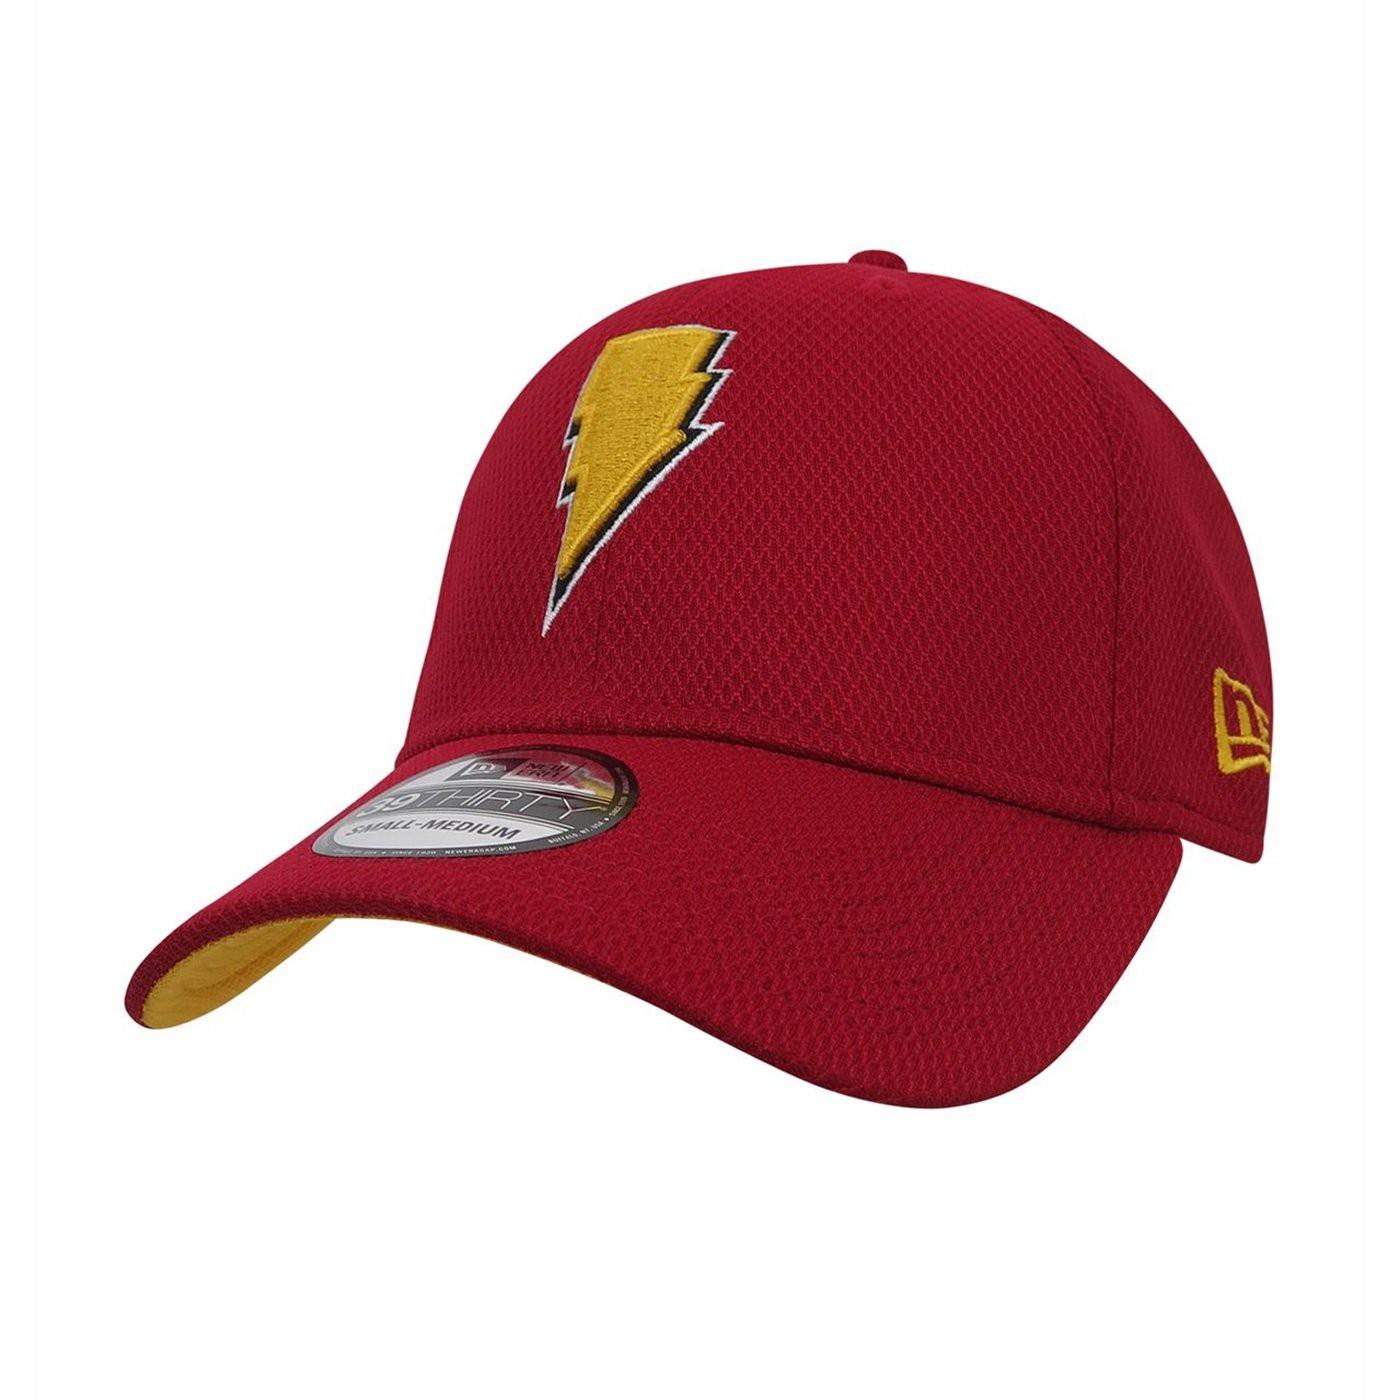 Shazam Symbol 39Thirty Fitted Hat